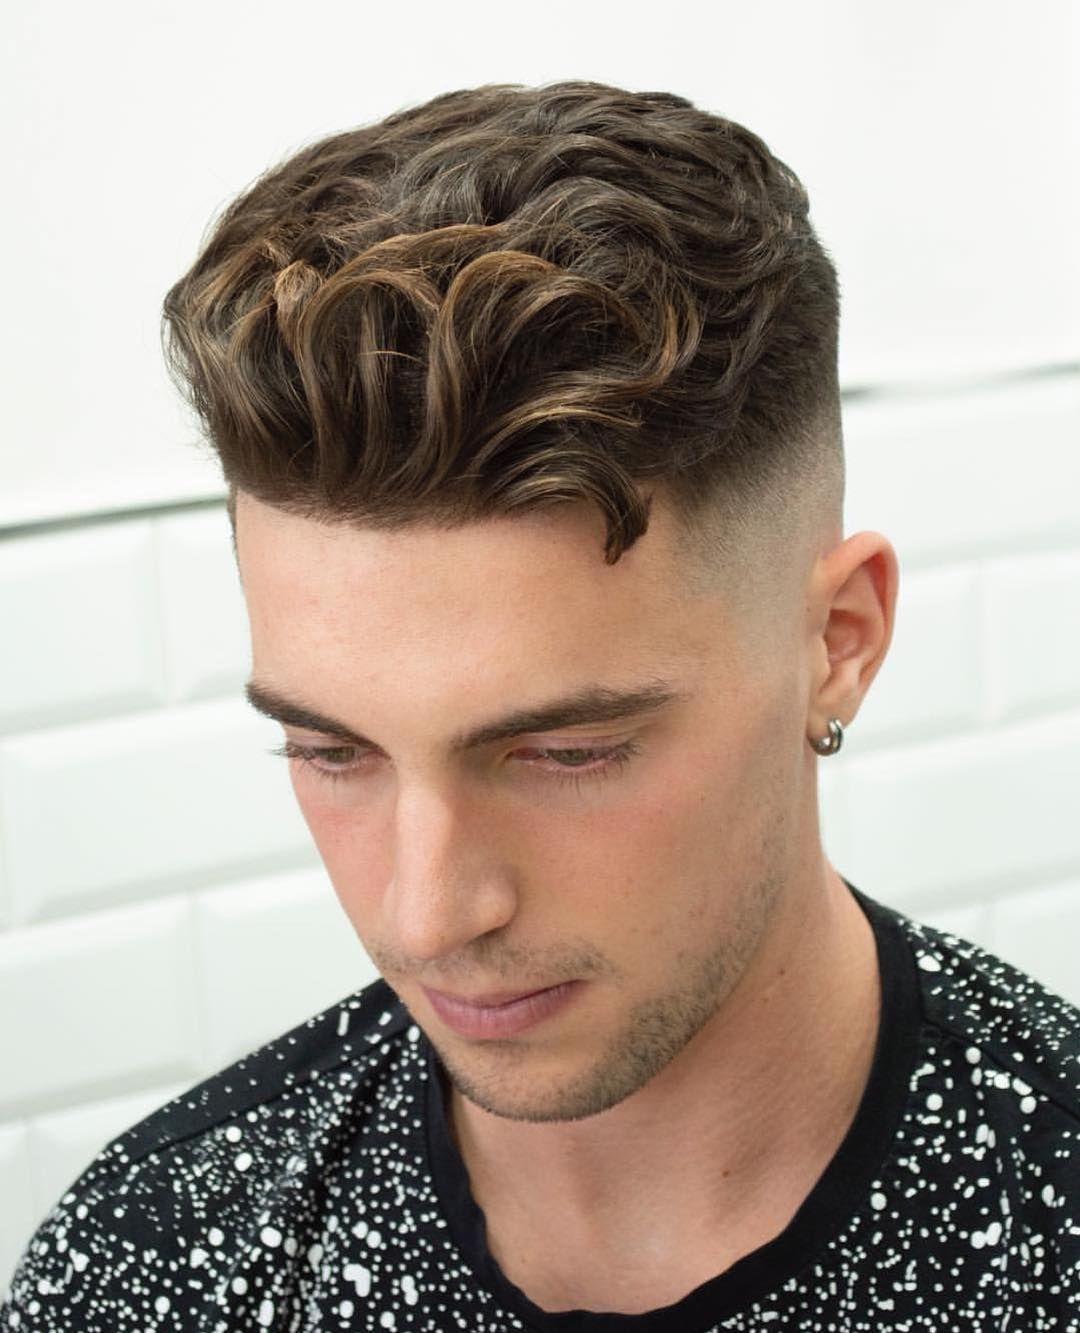 Men S Hair Haircuts Fade Haircuts Short Medium Long Buzzed Side Part Long Top Short Sides Hair Style Wavy Hair Men Undercut Hairstyles Curly Undercut